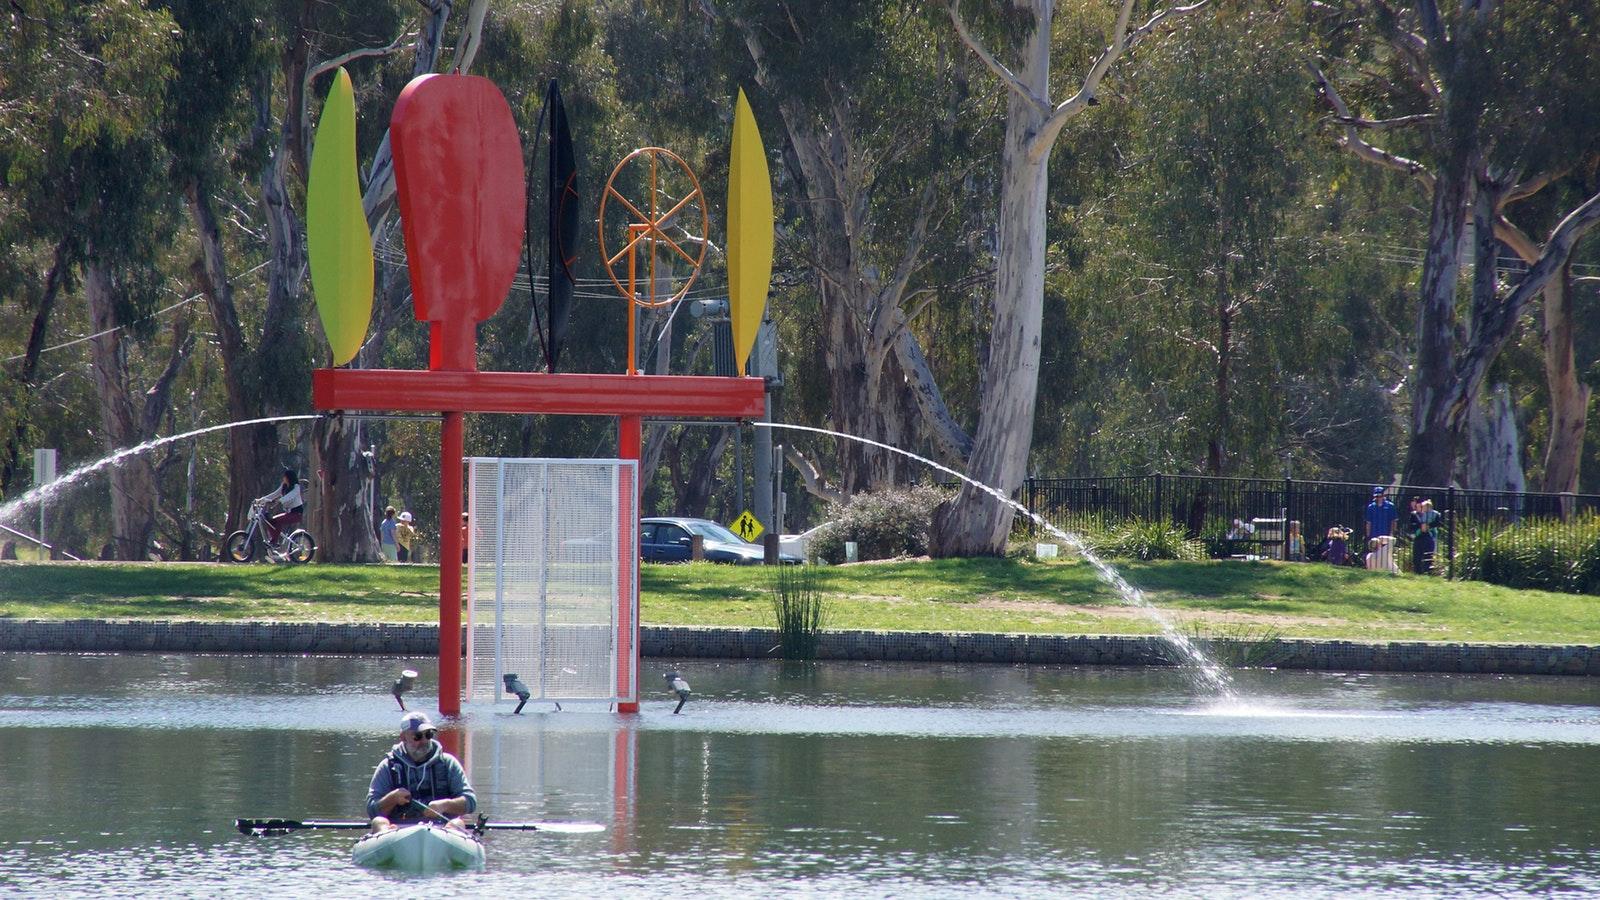 Federation Sculpture, Victoria Park Lake